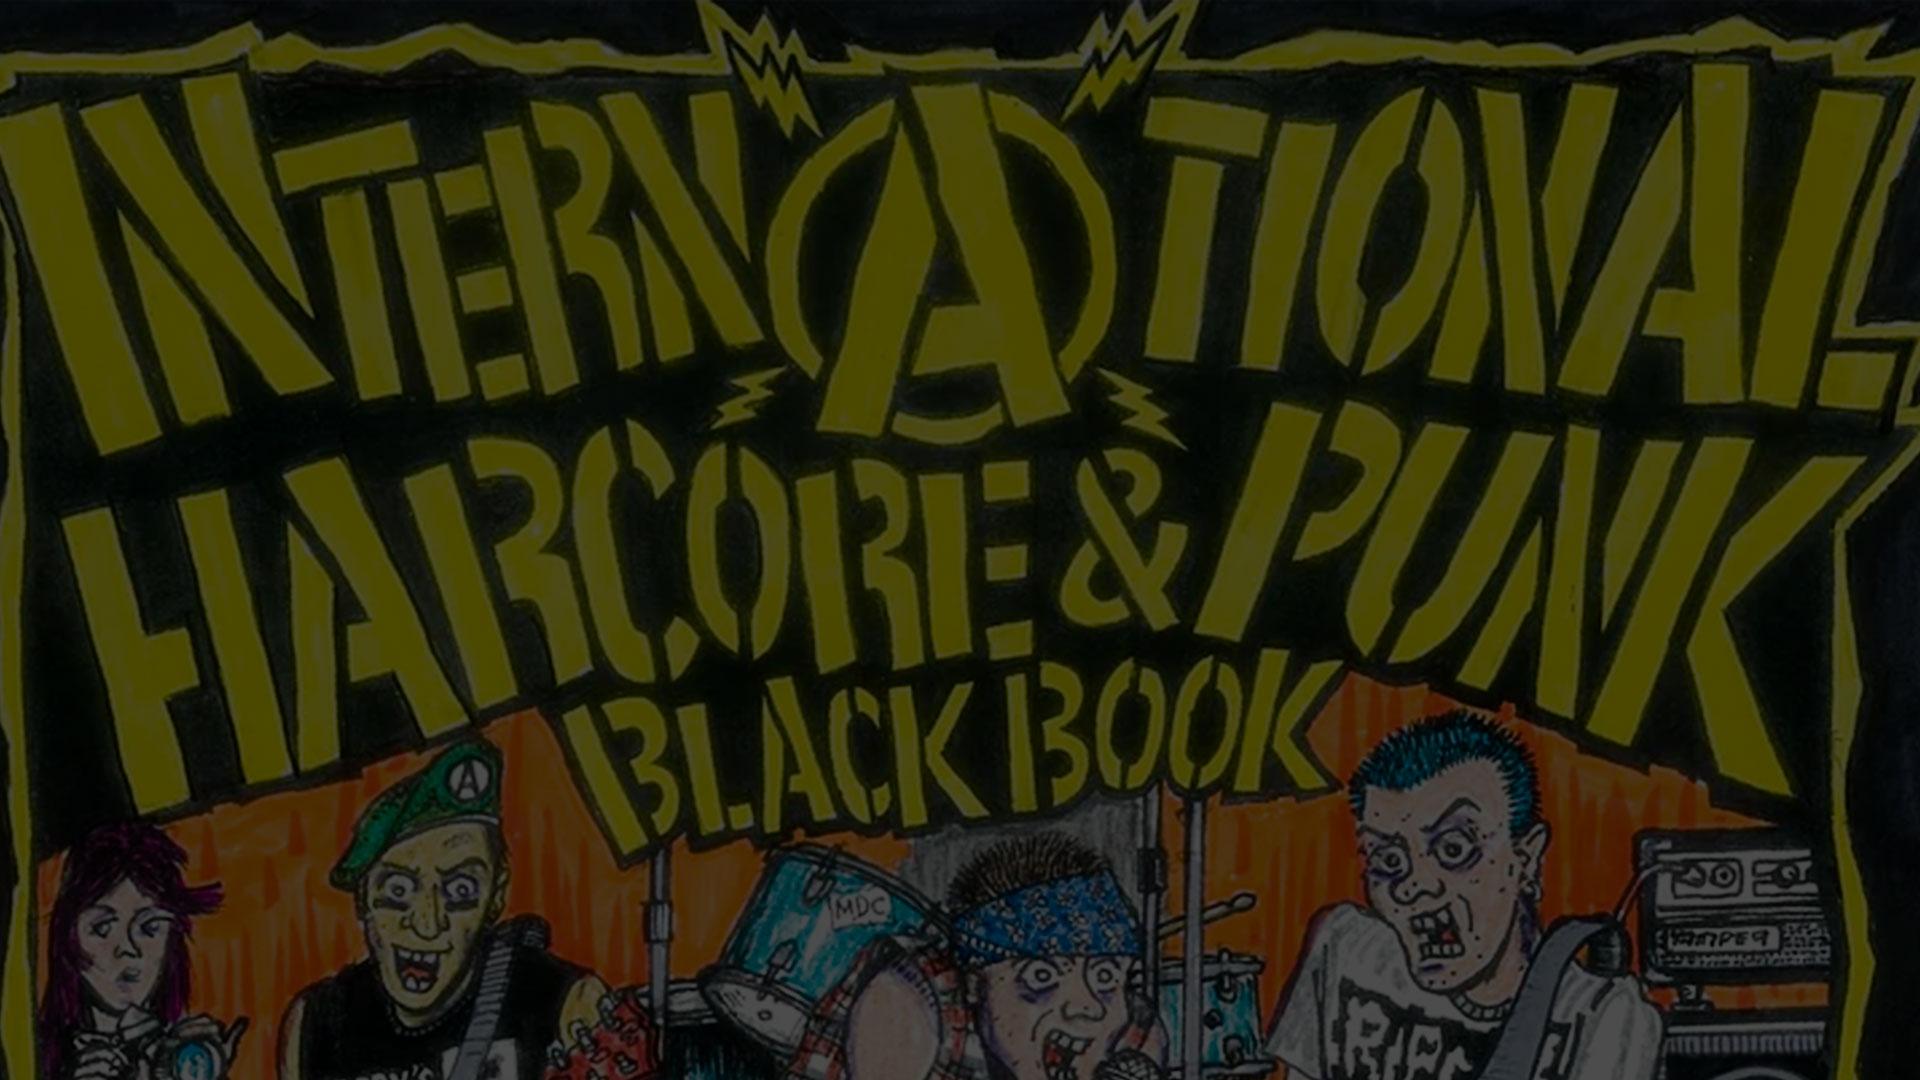 International Hardcore & Punk Blackbook